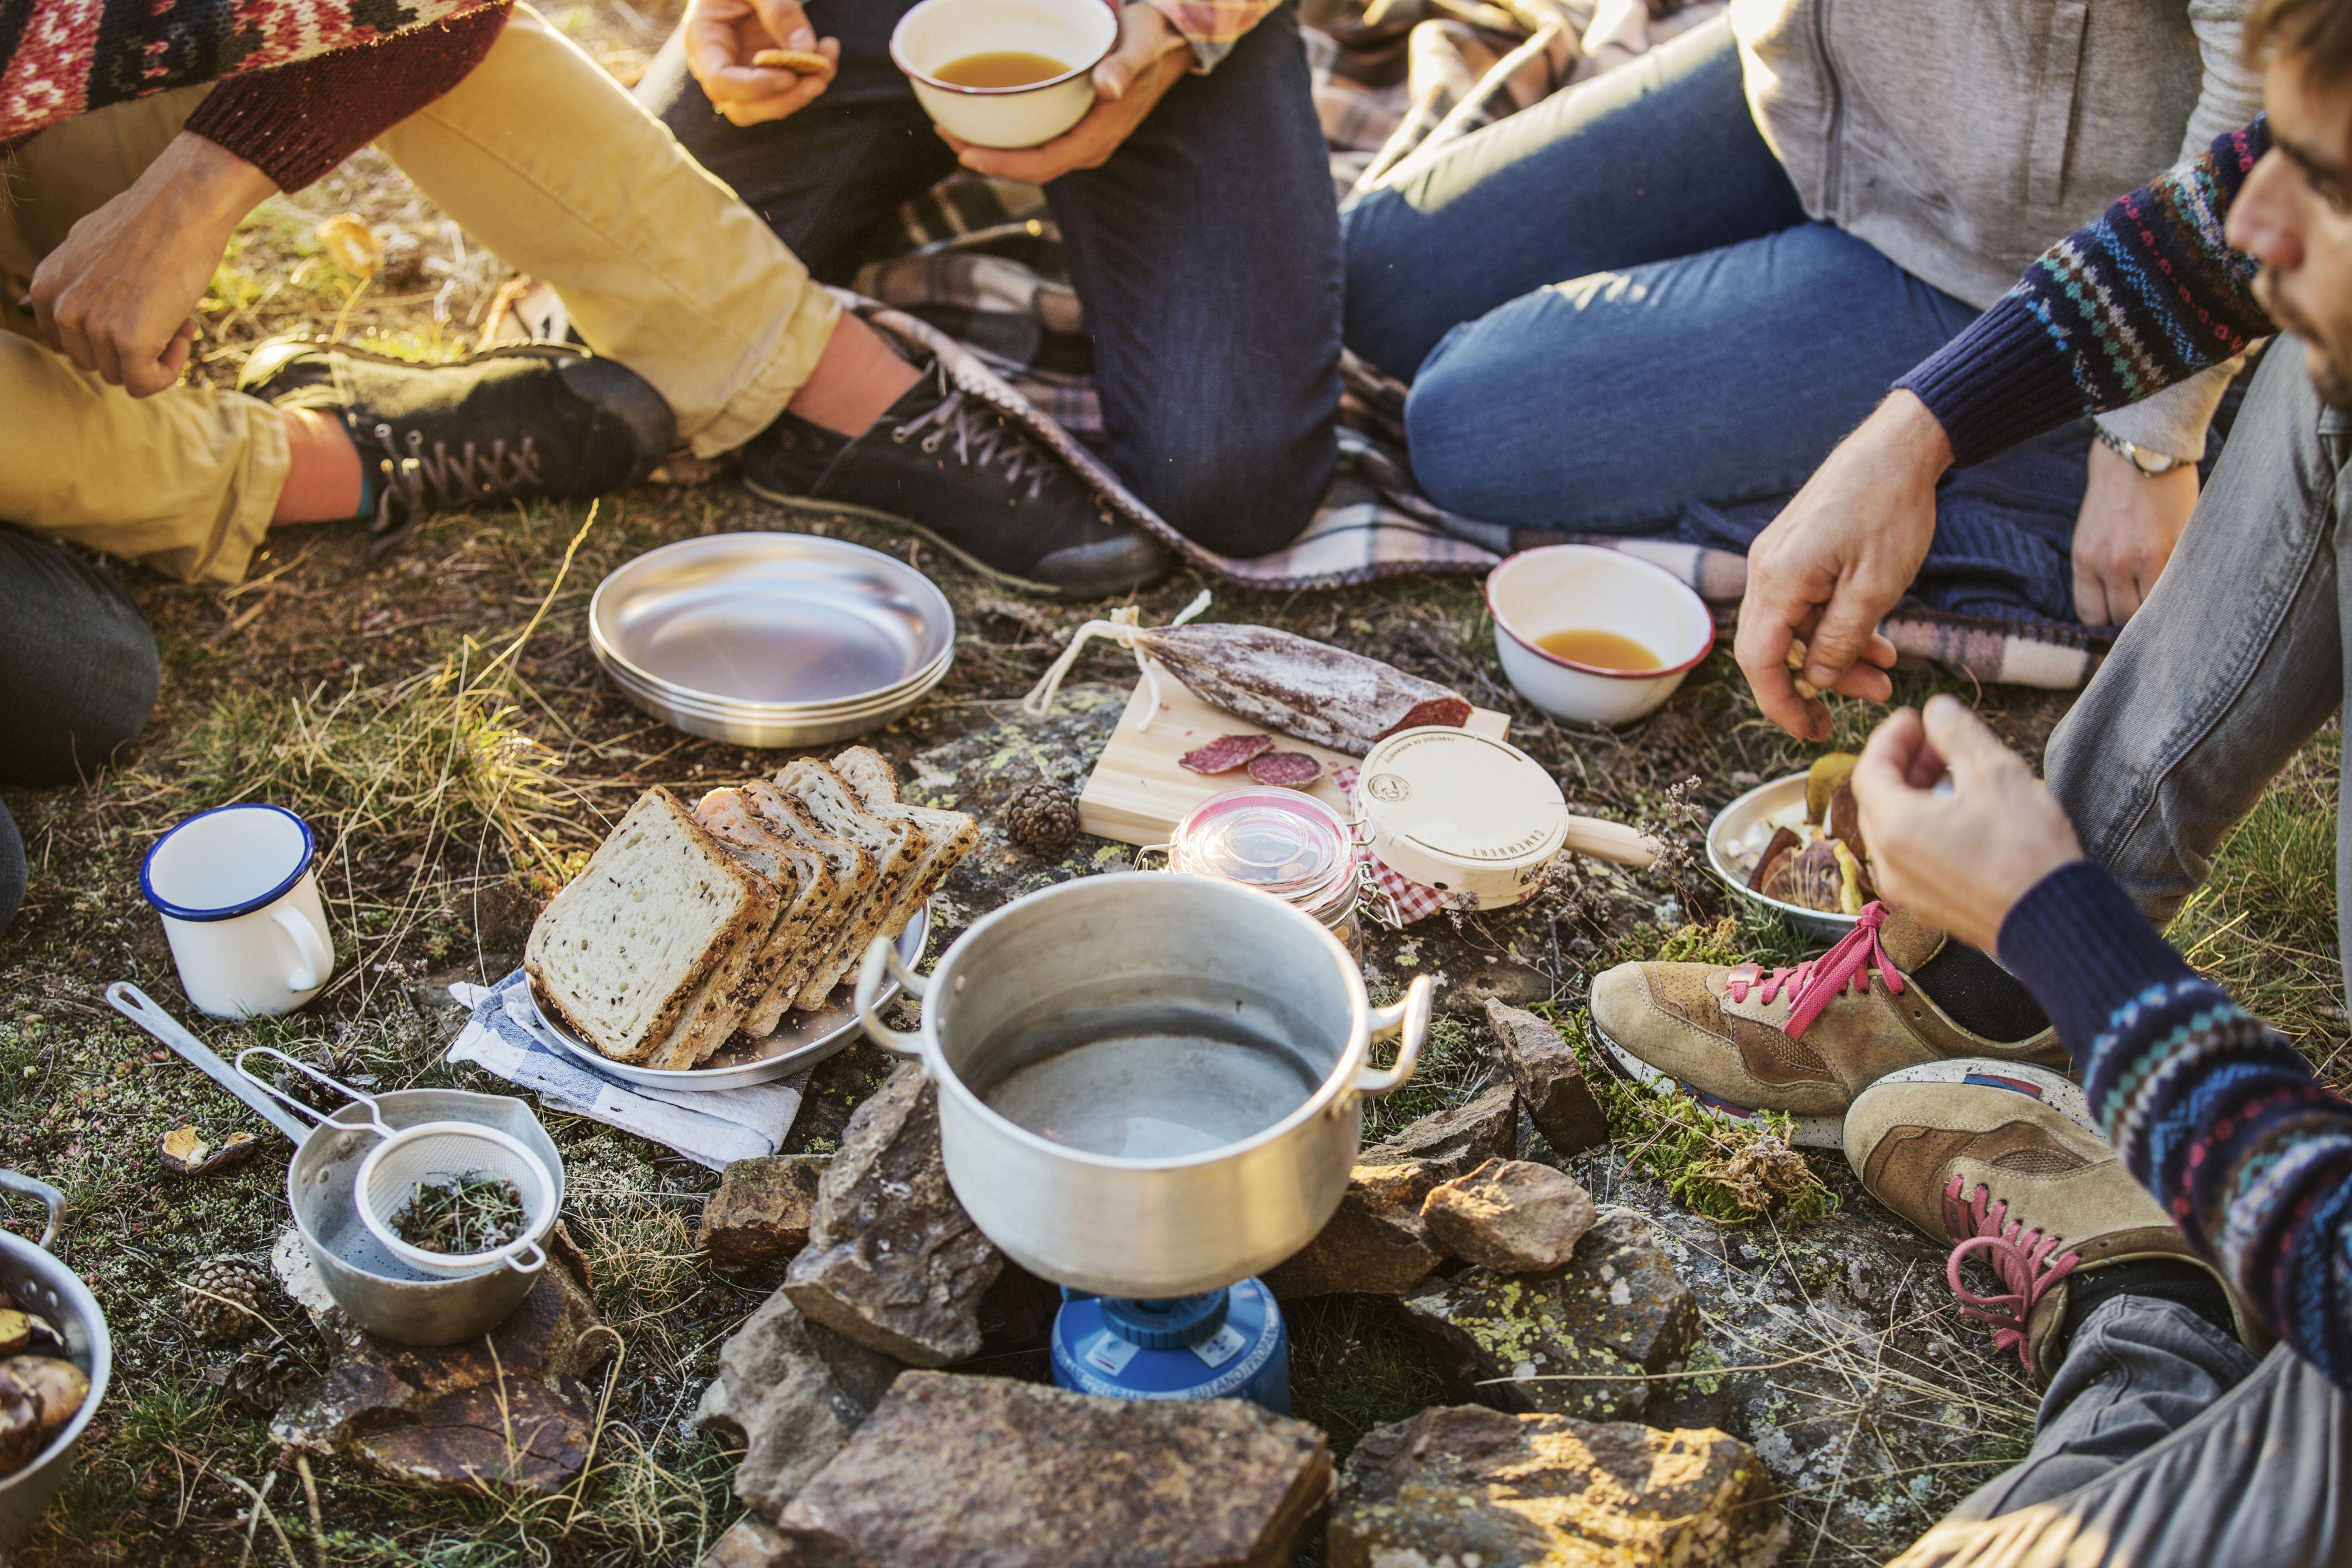 Camping Food Essentials Checklist